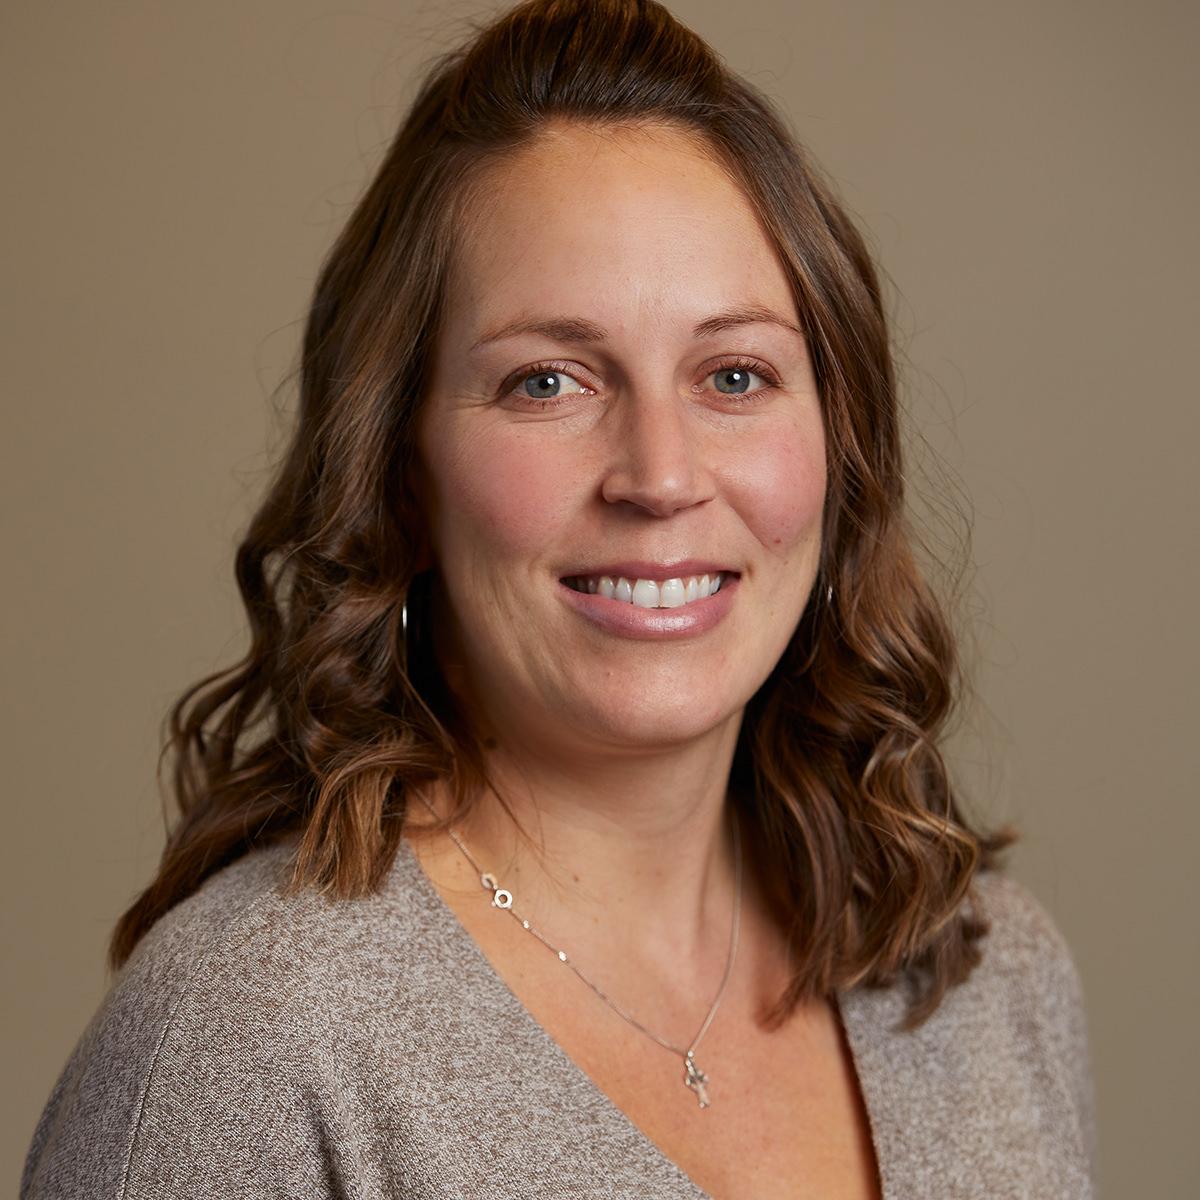 Kristin Shiner